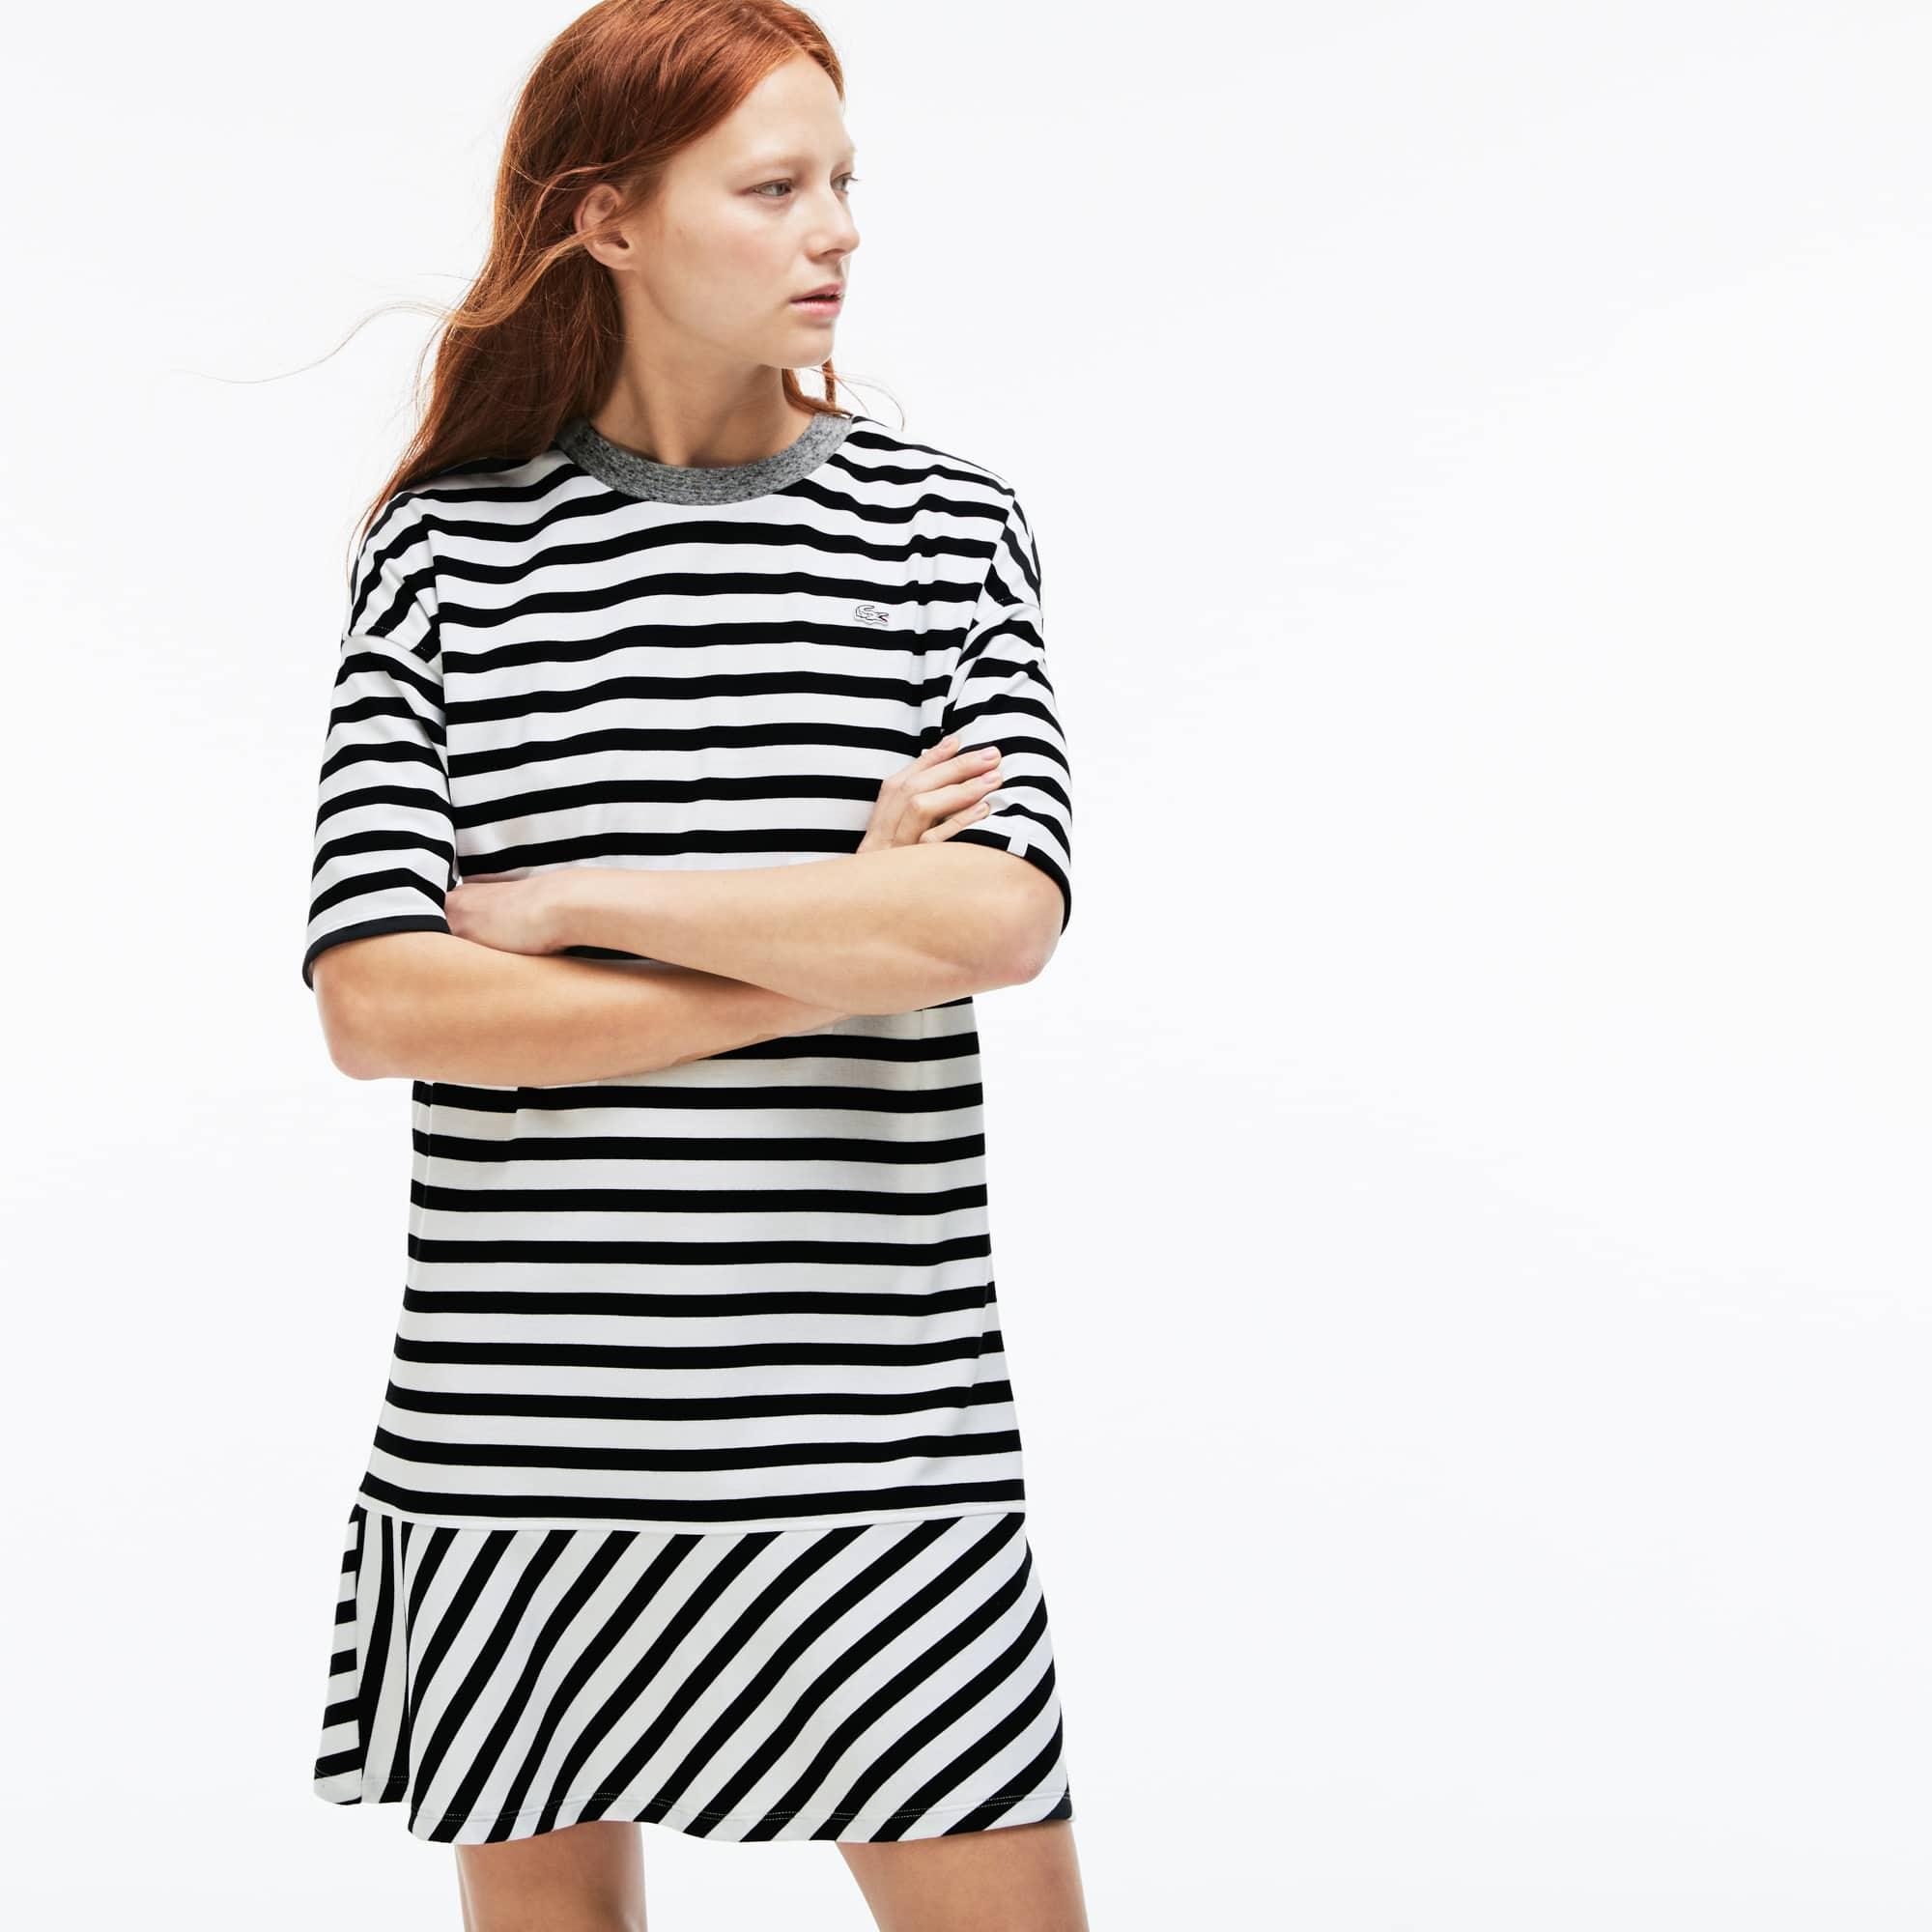 Maritimes Damen-Kleid aus Jersey mit Kontrastsäumen LACOSTE L!VE